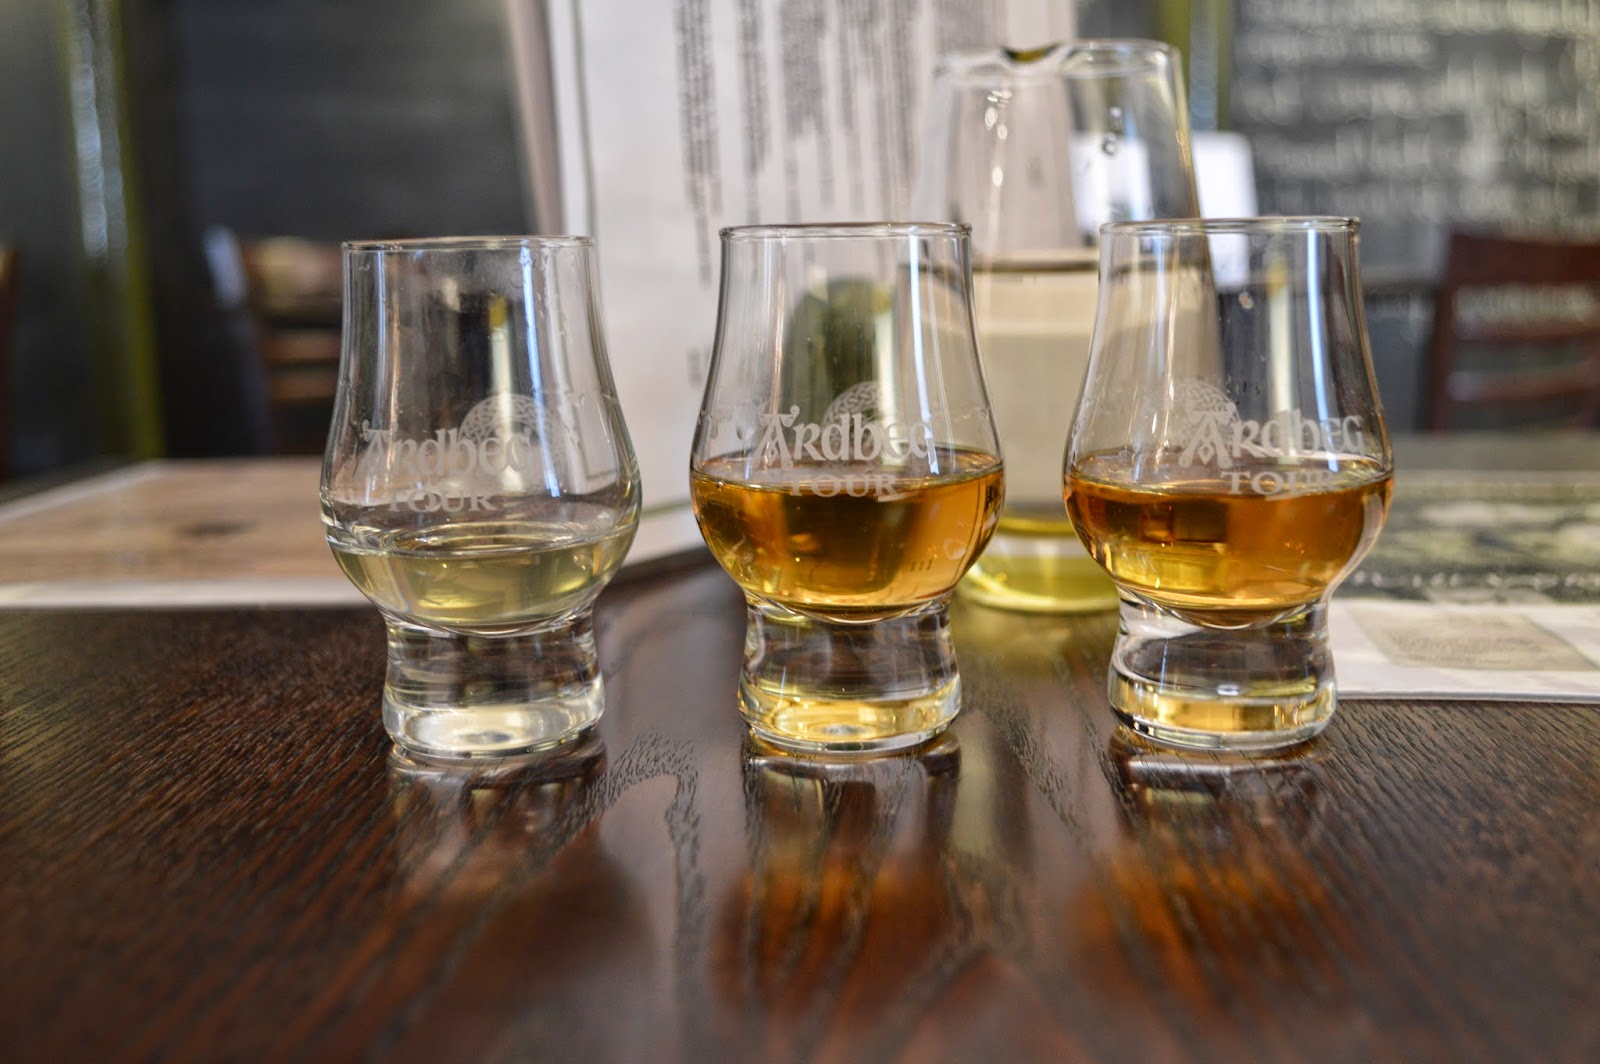 Whisky tasting at Ardbeg Distillery, Islay, Scotland